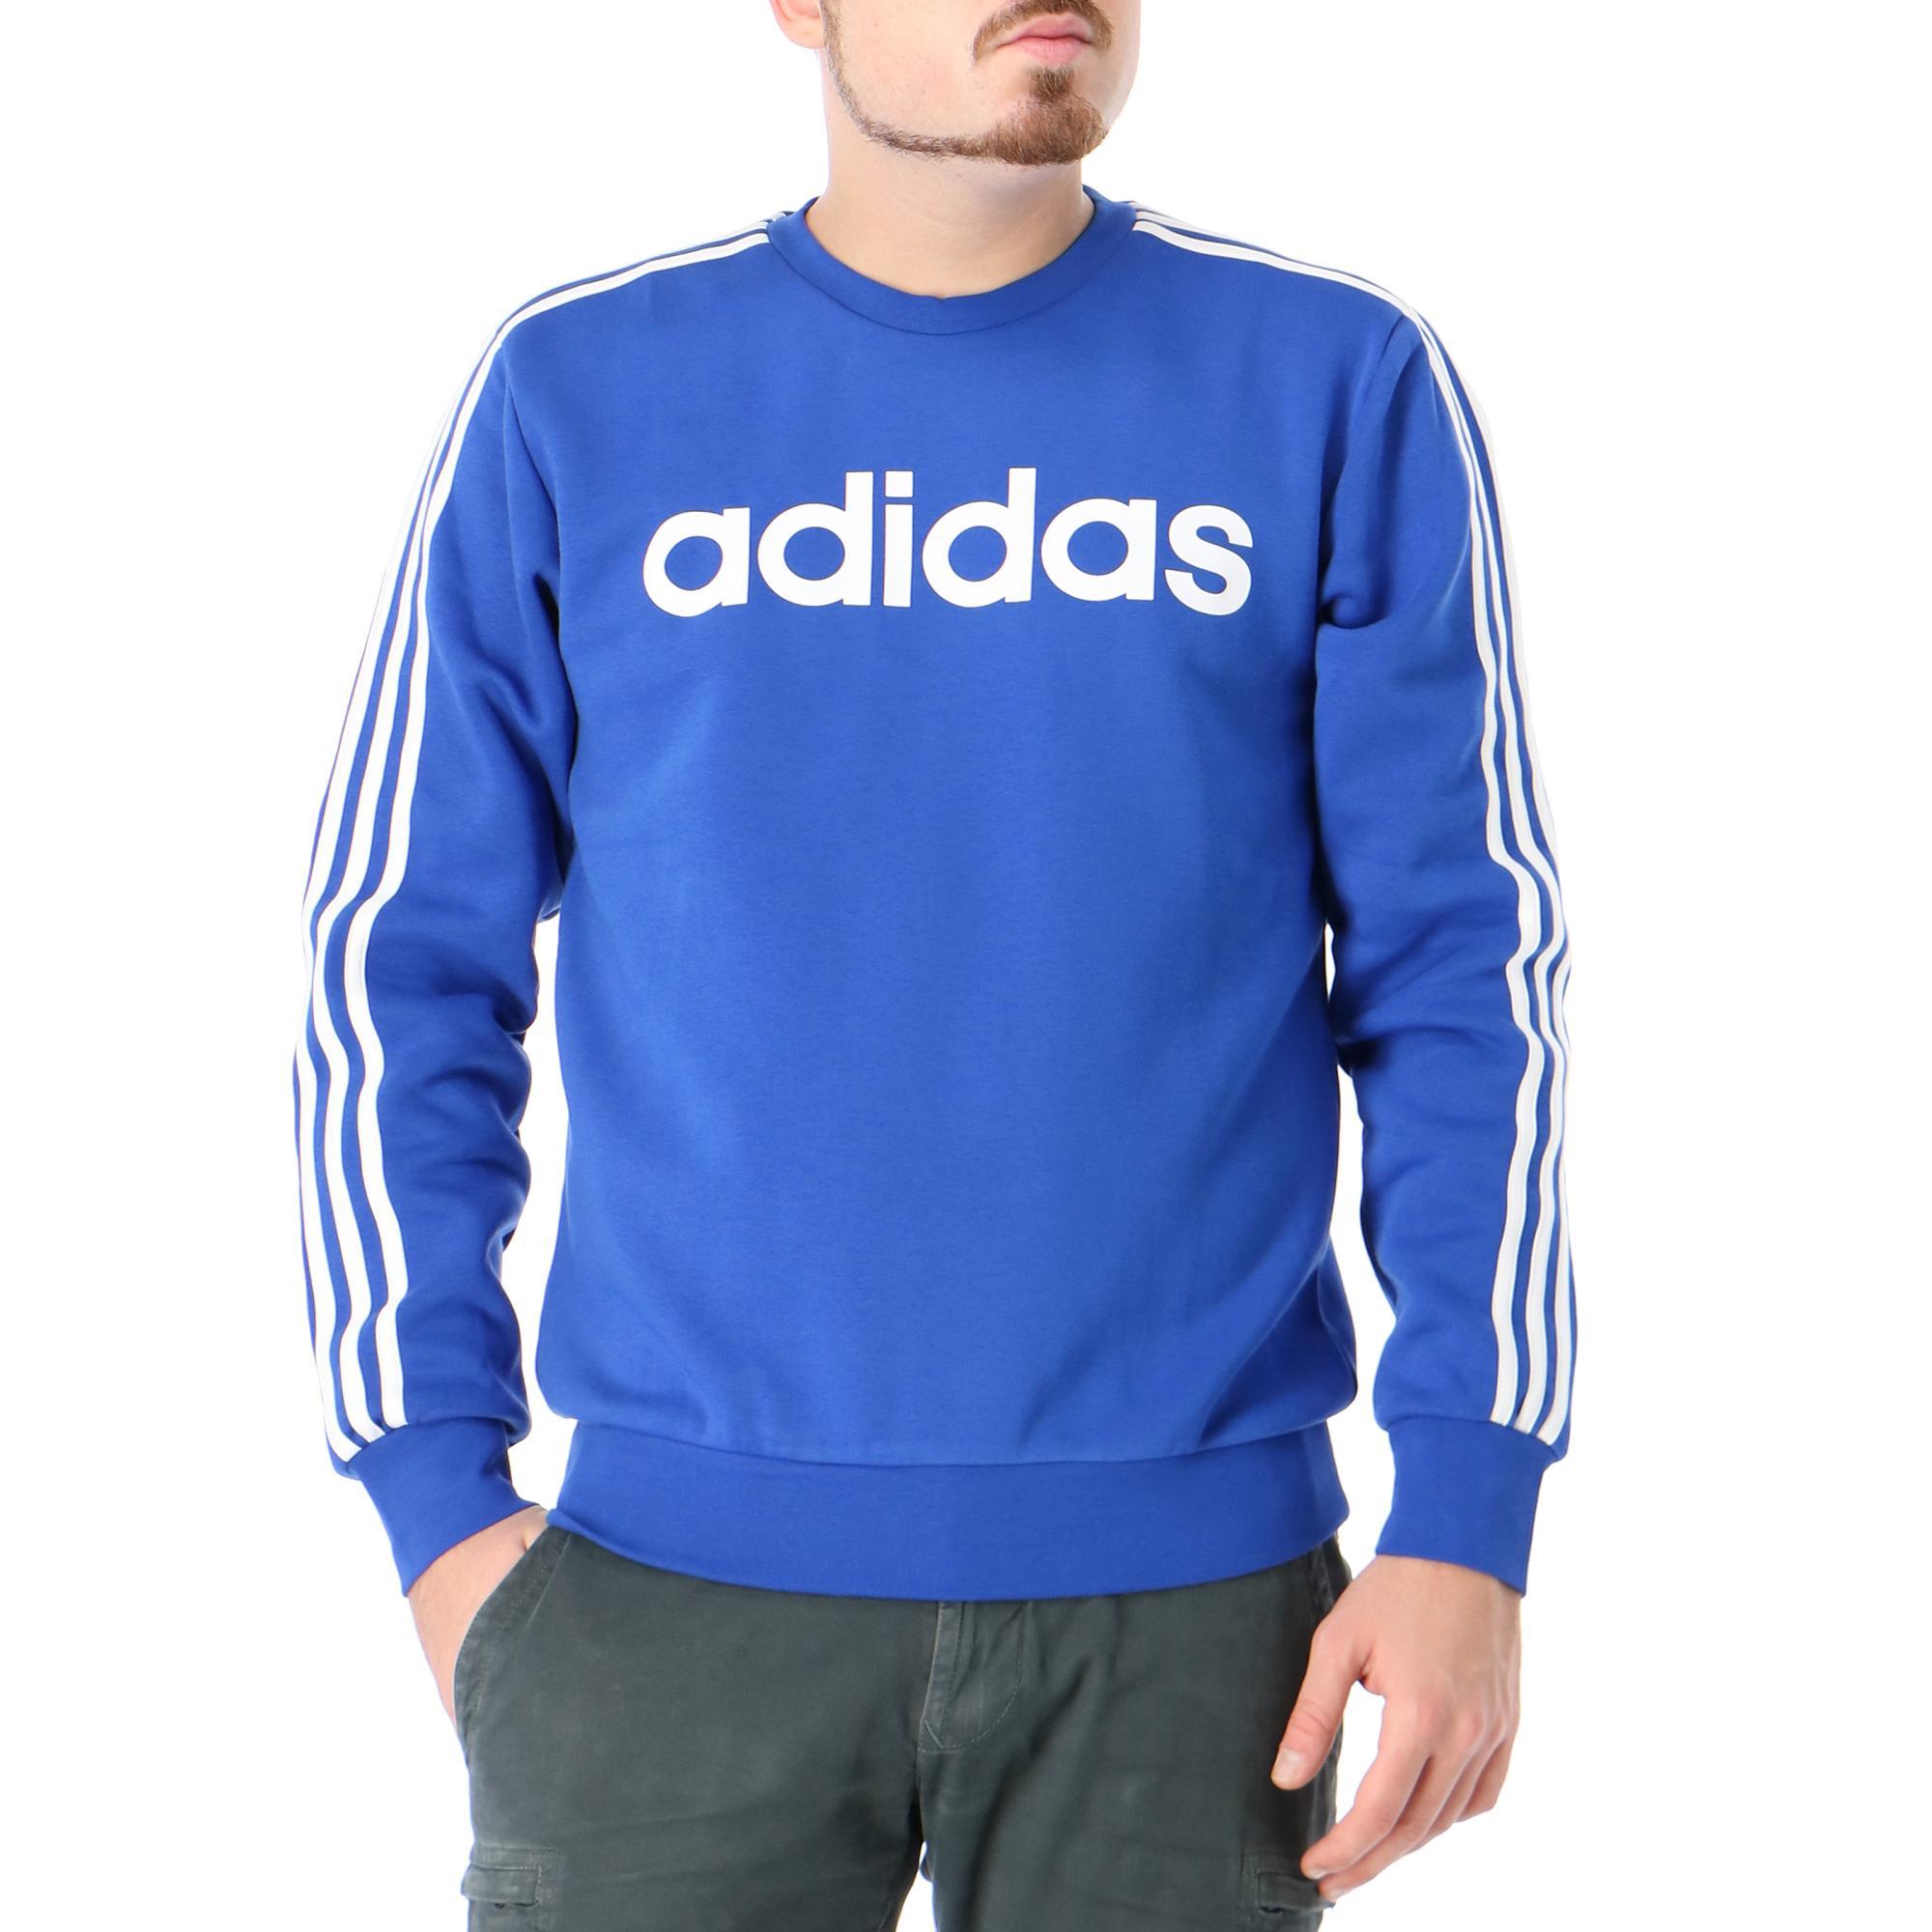 Adidas E 3s Crew Fl Team royal blue white